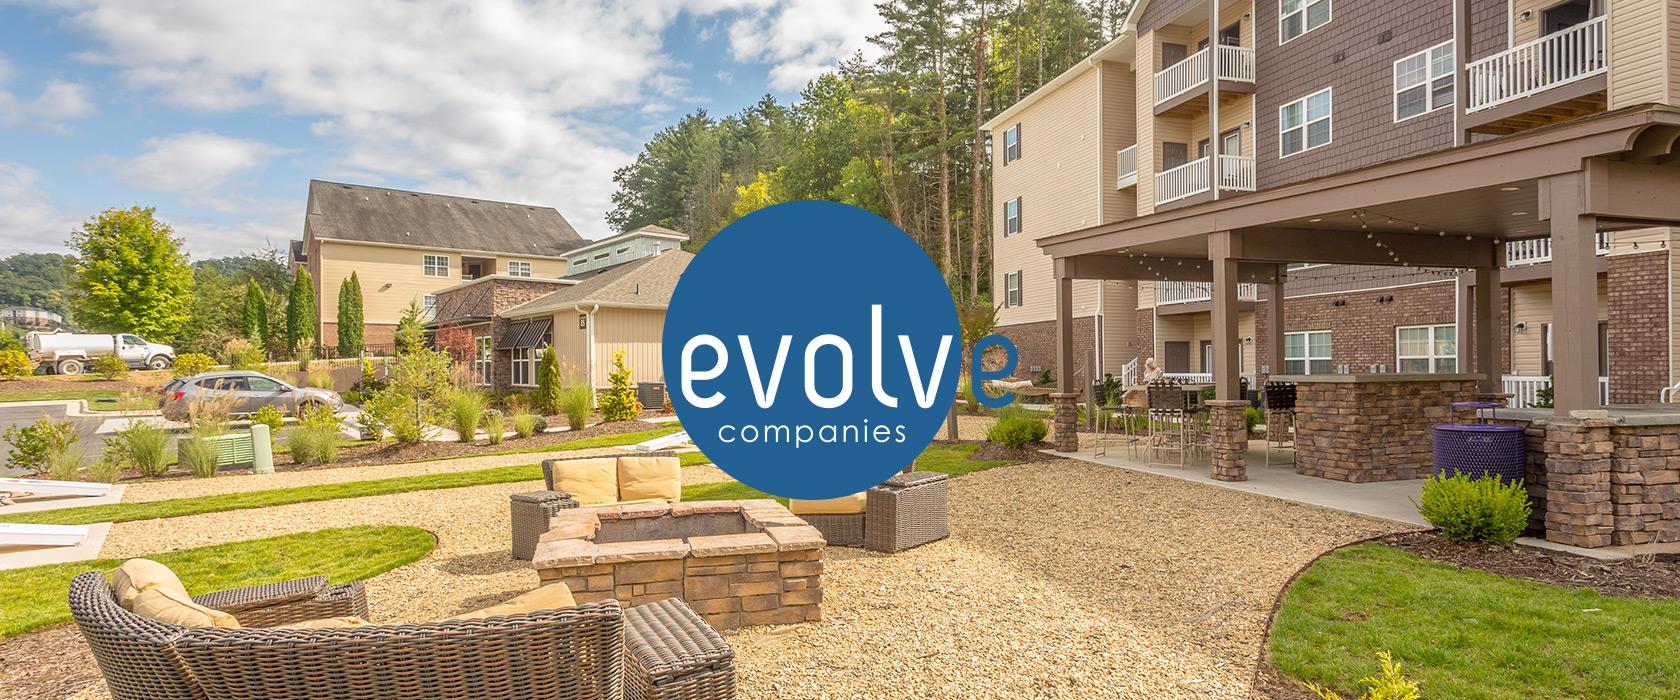 Evolve Companies Real Estate Development Brand Identity System Design